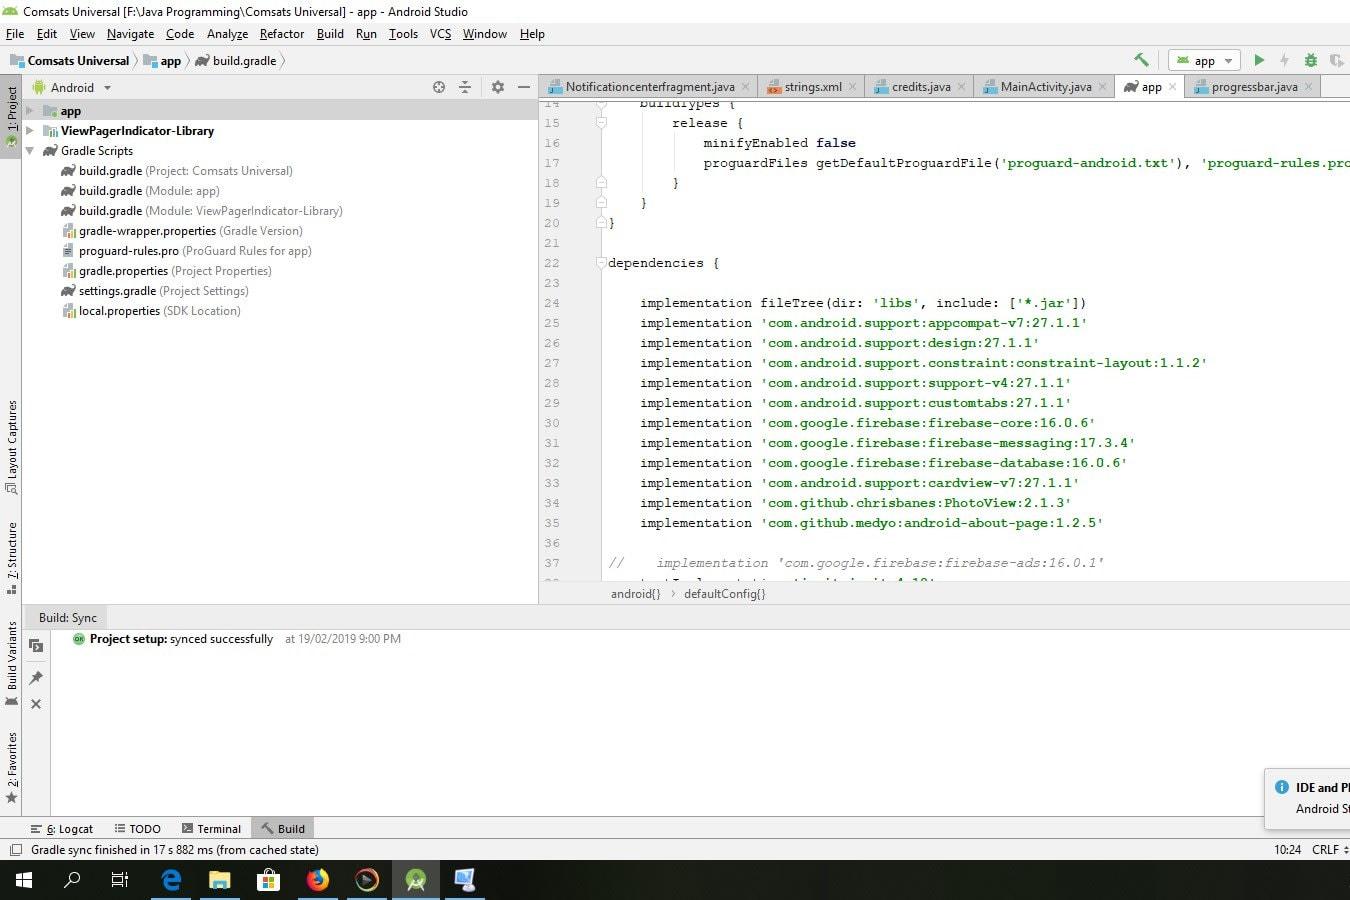 Portfolio for Native/Hybrid Mobile Apps Developer